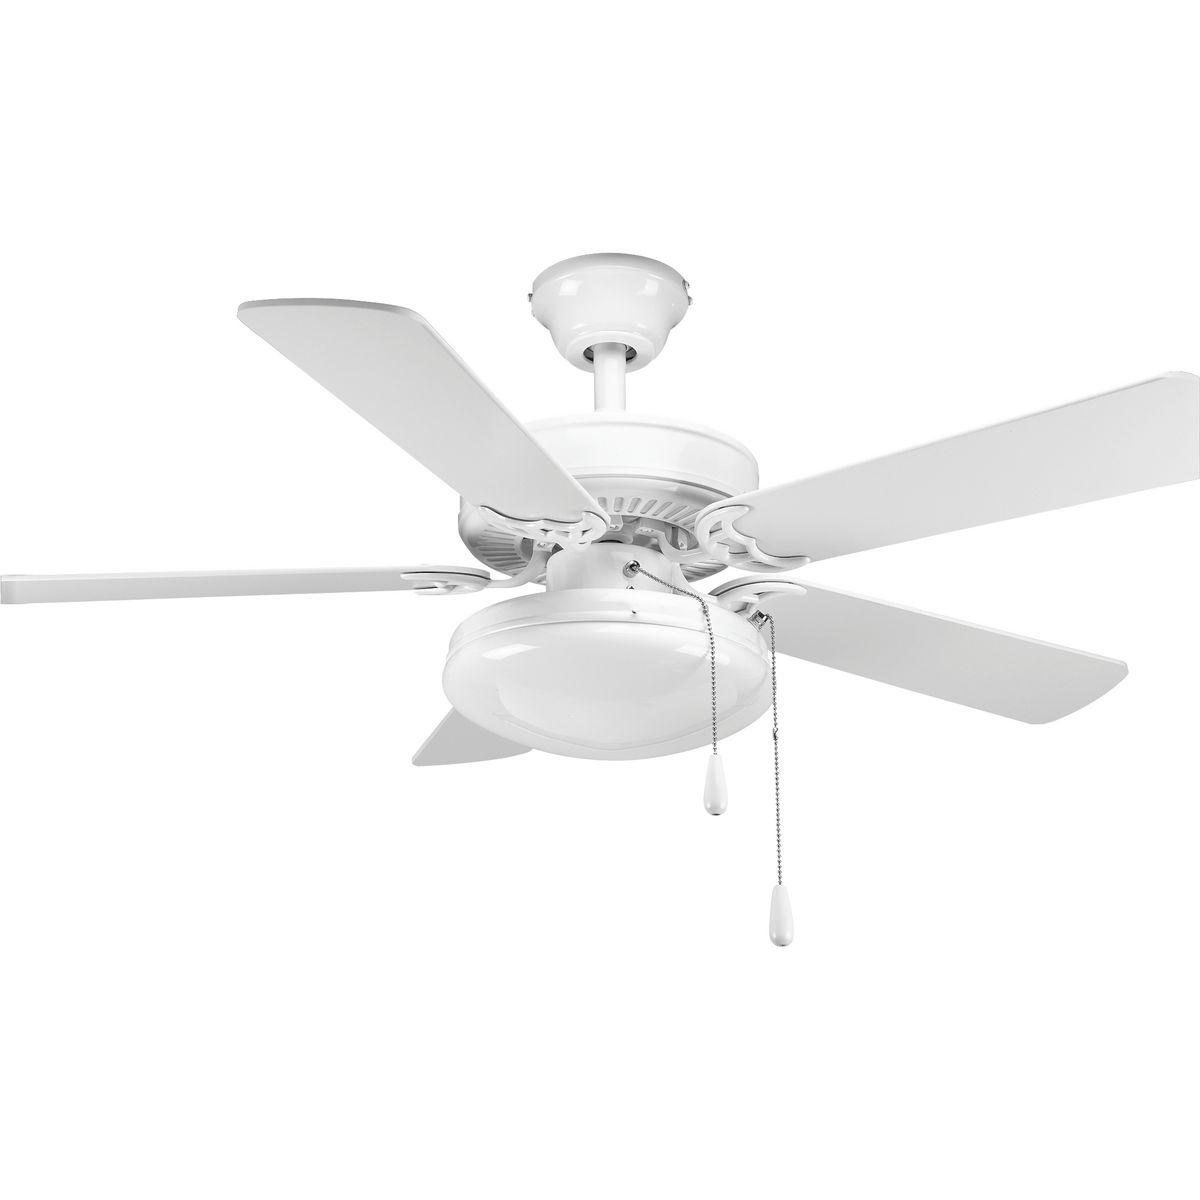 Airpro collection builder 42 5 blade ceiling fan brand progress progp250030 w p260230prodimage aloadofball Choice Image